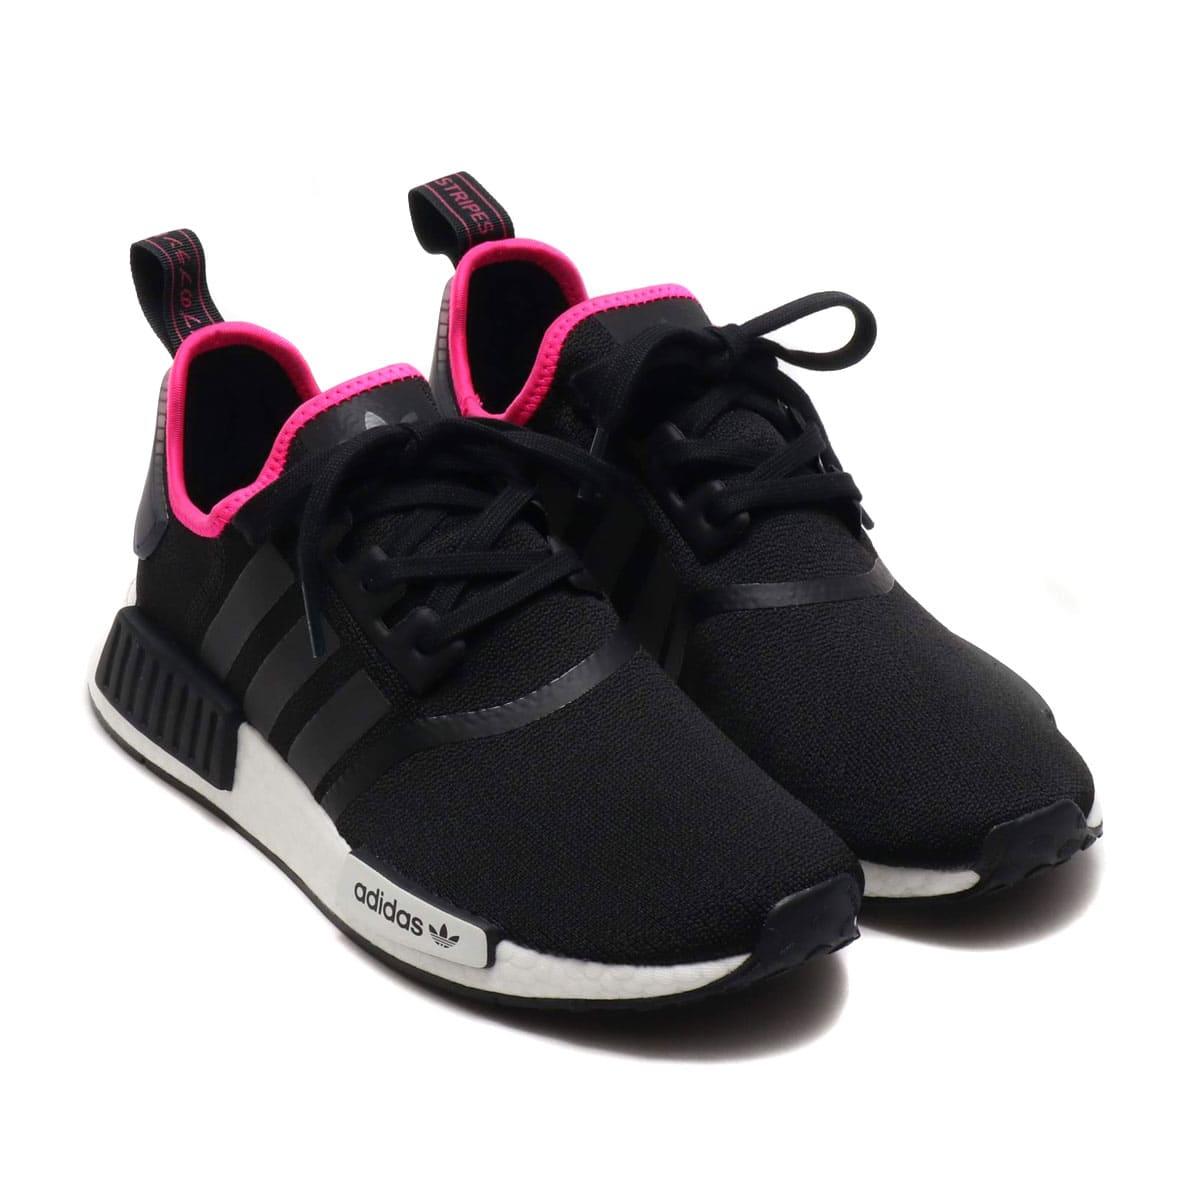 adidas Originals NMD_R1 CORE BLACK/CORE BLACK/SHOCK PINK 19SS-I_photo_large